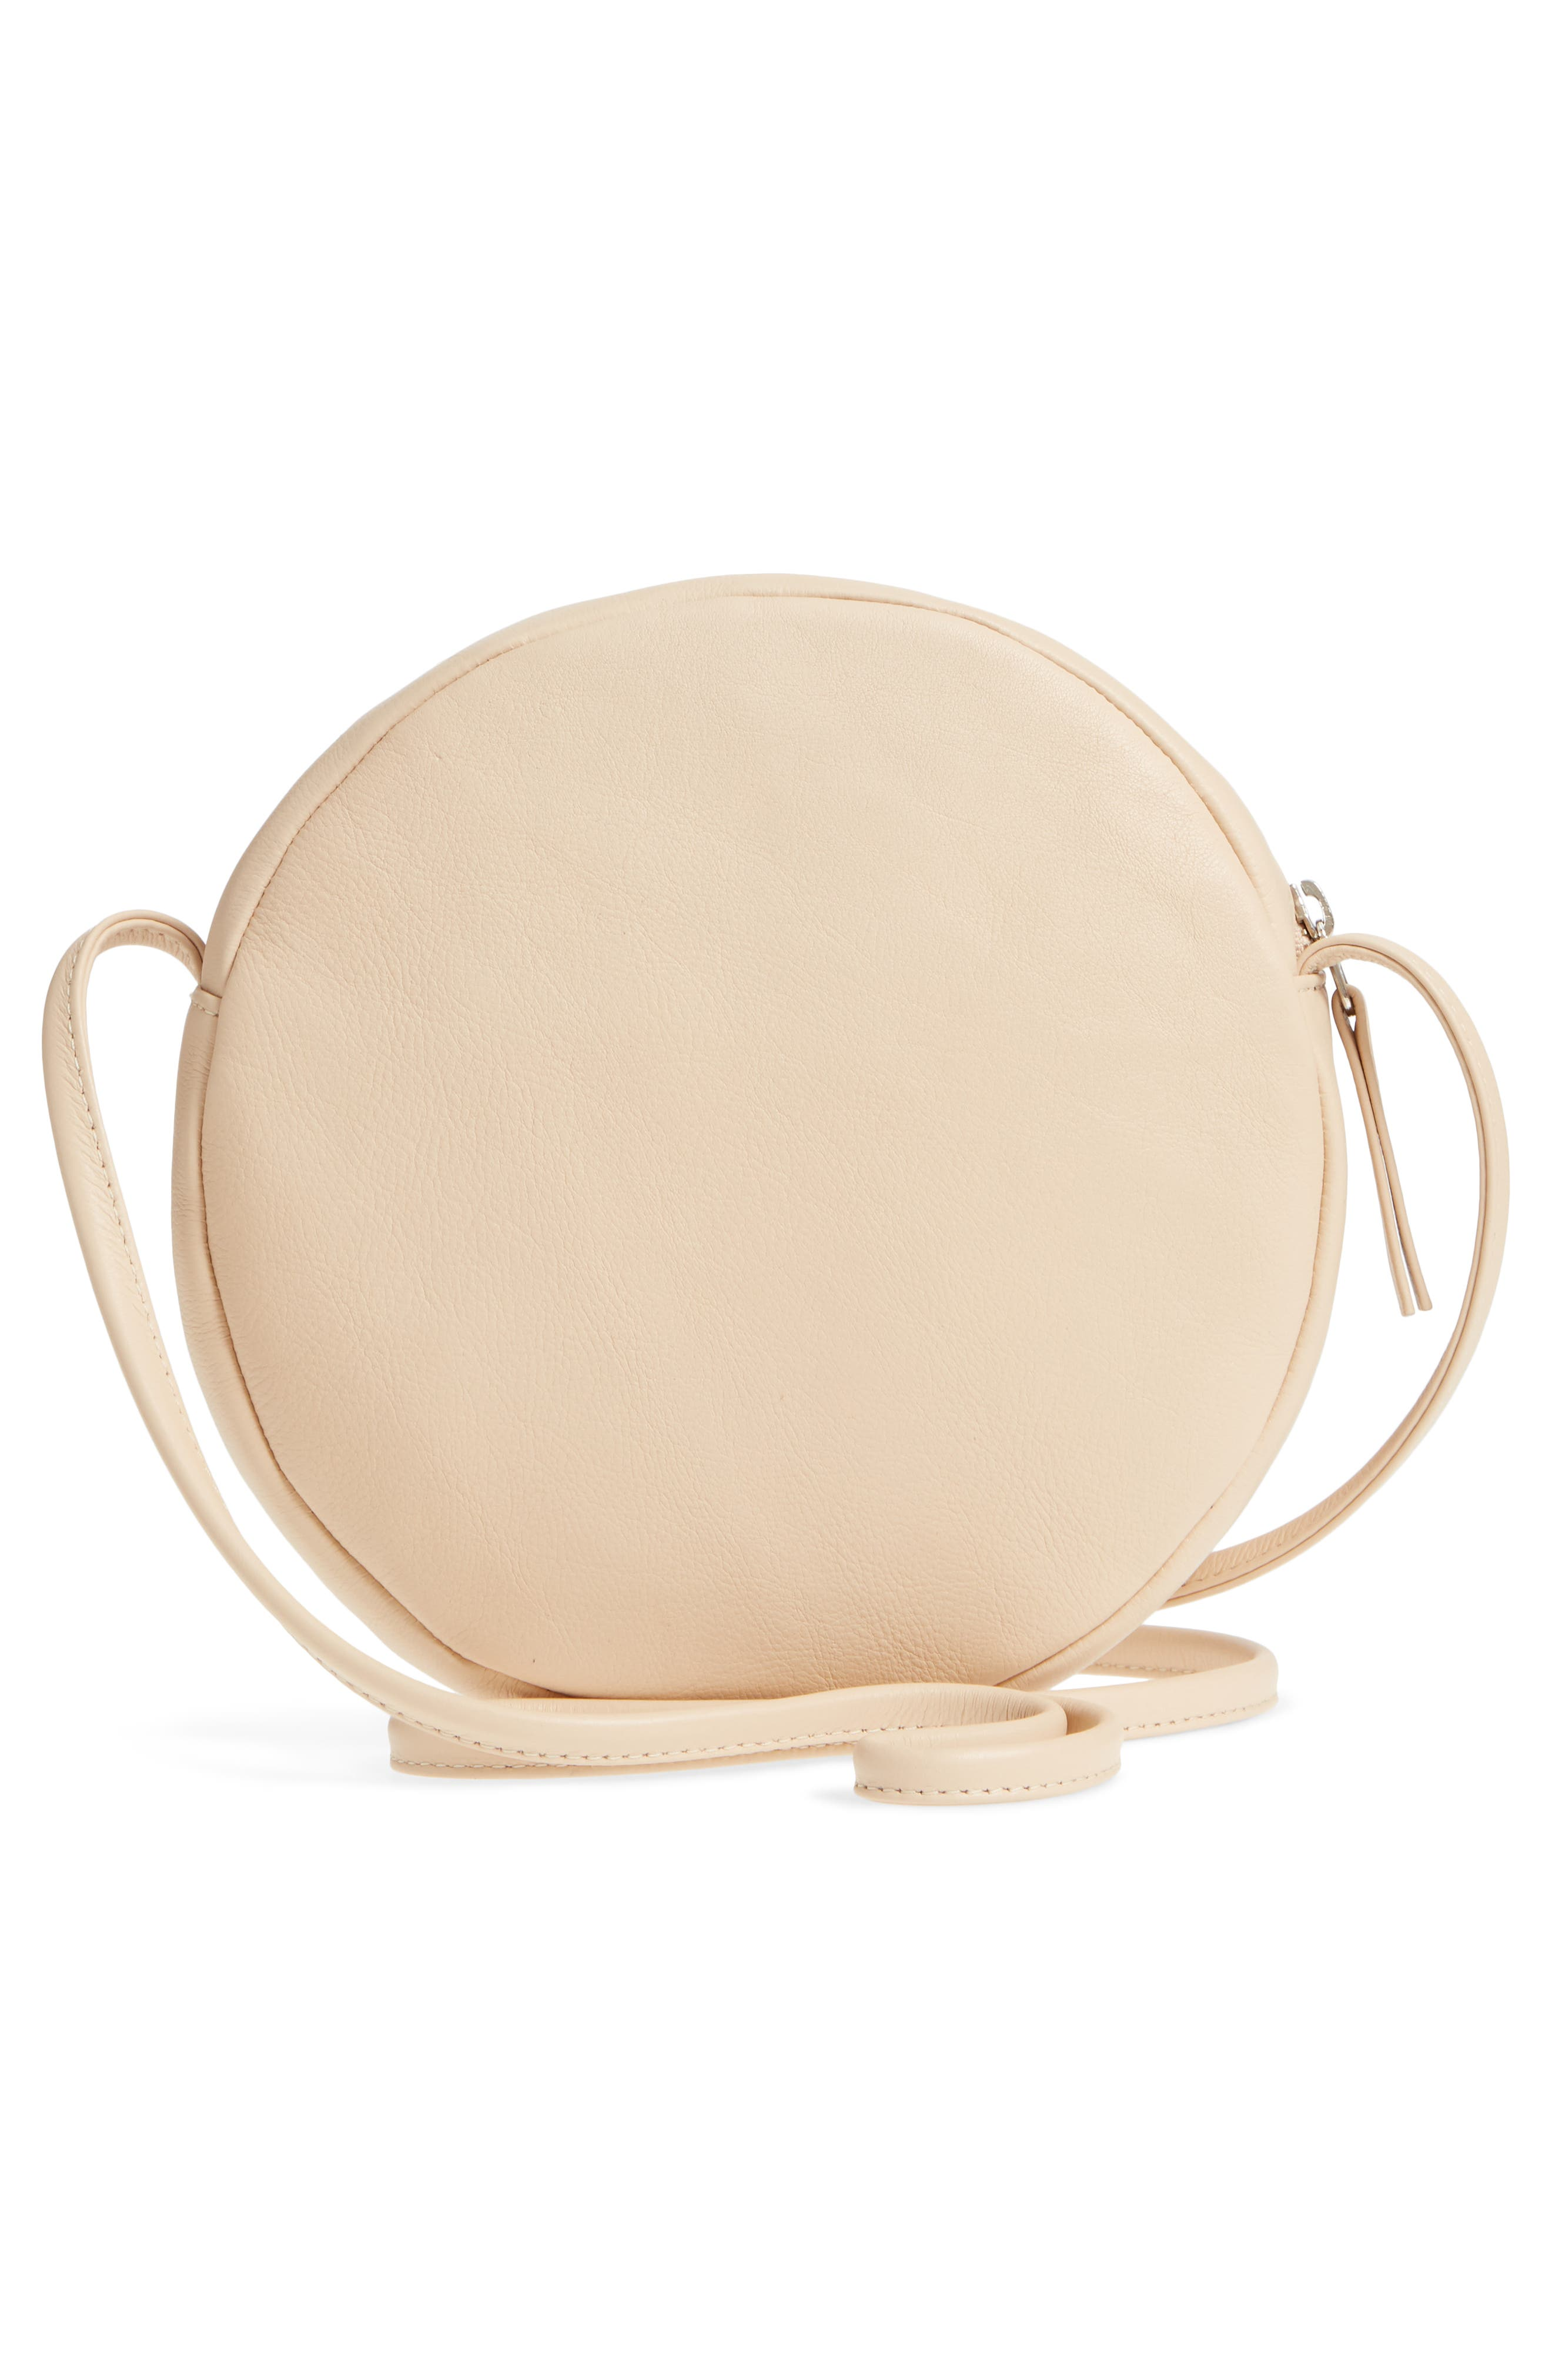 Circle Calfskin Leather Crossbody Bag,                             Alternate thumbnail 9, color,